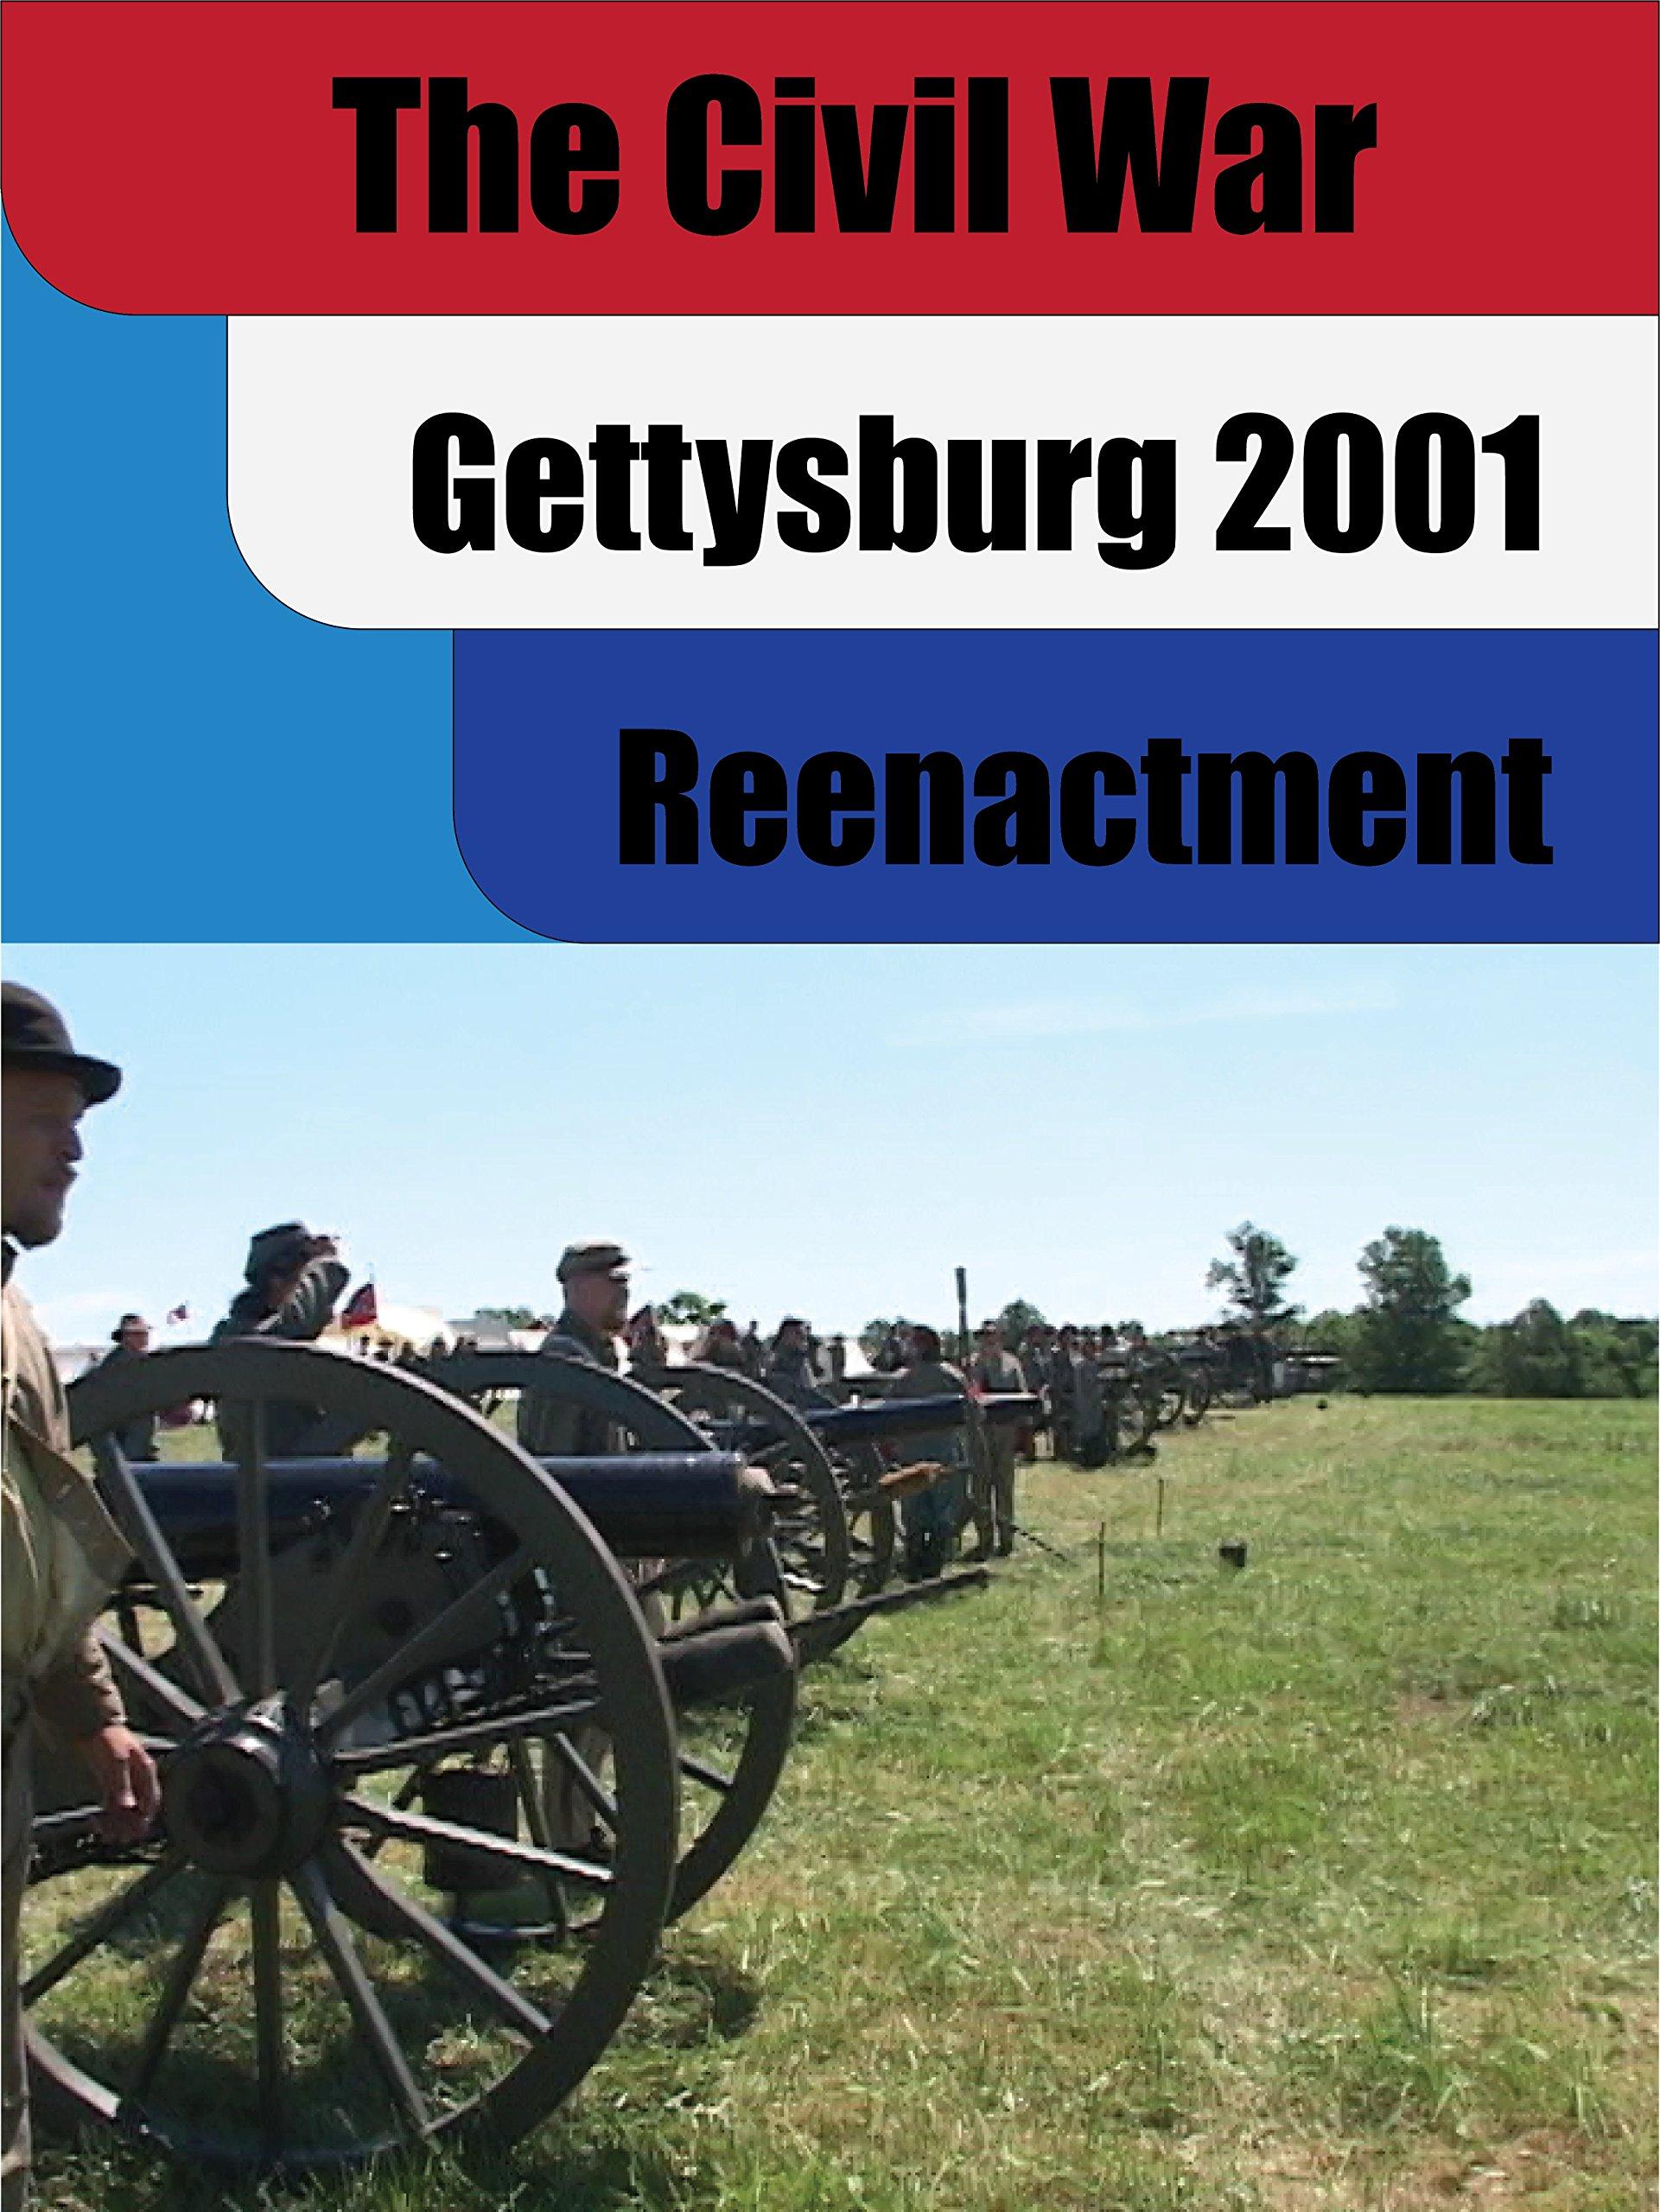 The Civil War Reenacted: Gettysburg 2001